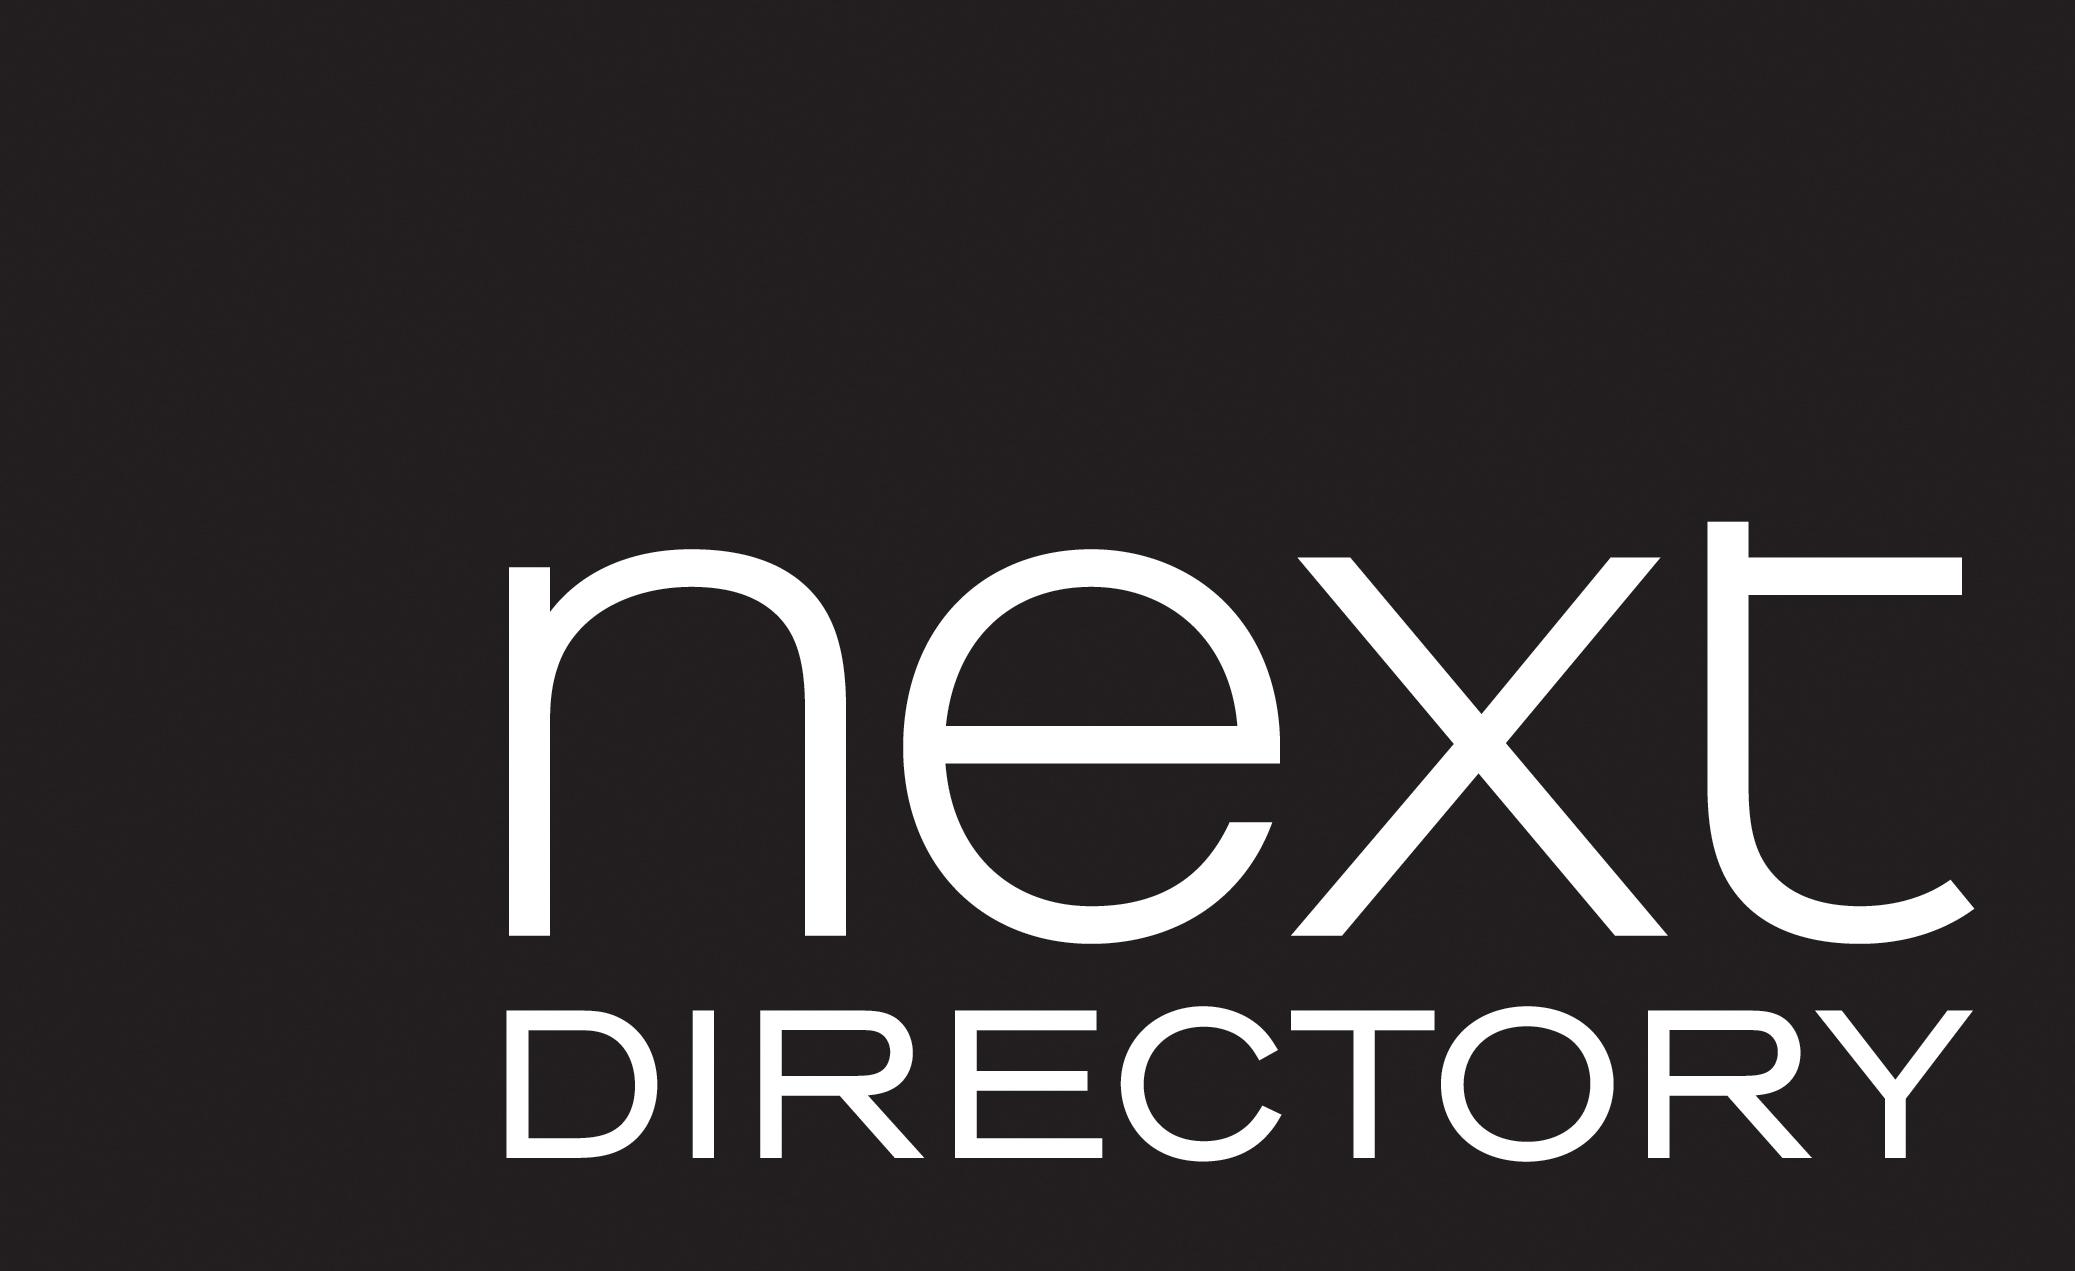 File:Next DIRECTORY.jpg - Wikipedia, the free encyclopedia: en.wikipedia.org/wiki/File:Next_DIRECTORY.jpg